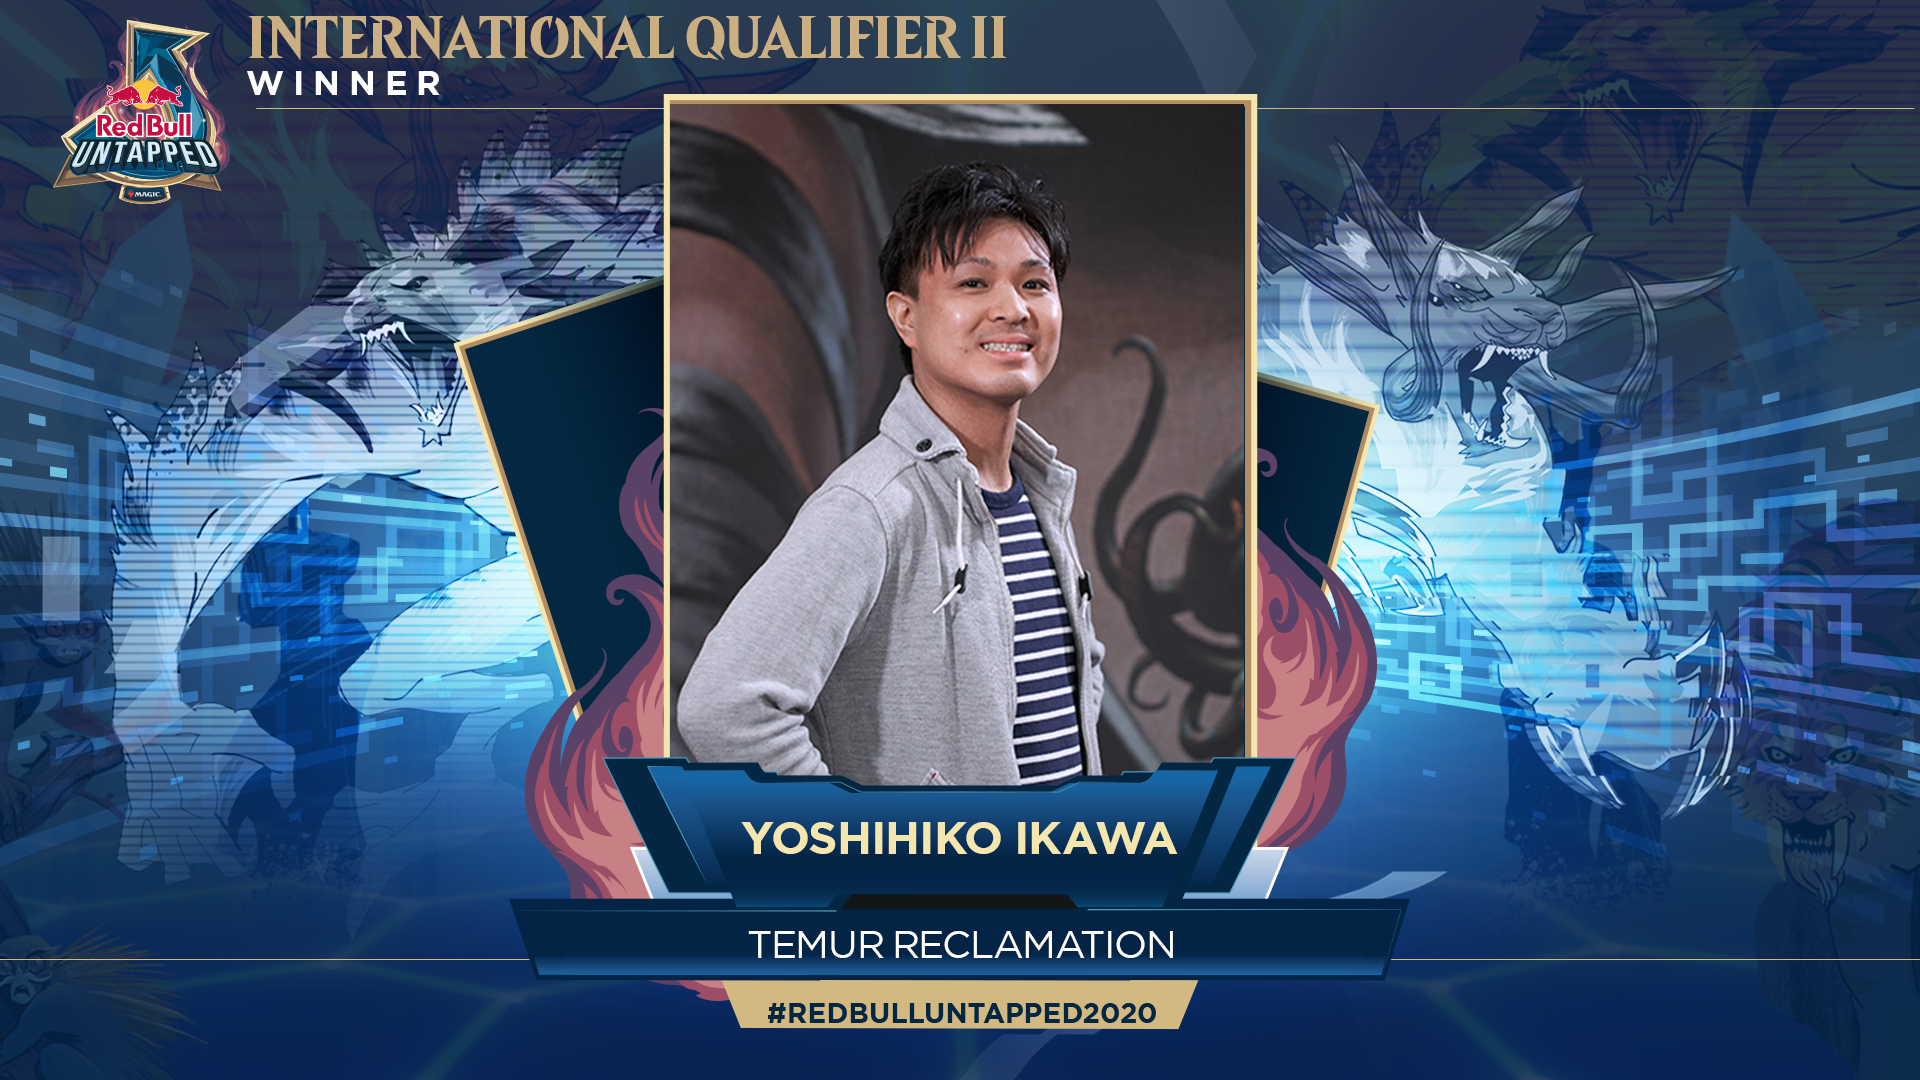 Yoshihiko Ikawa venceu o Qualificatório Internacional II do Red Bull Untapped